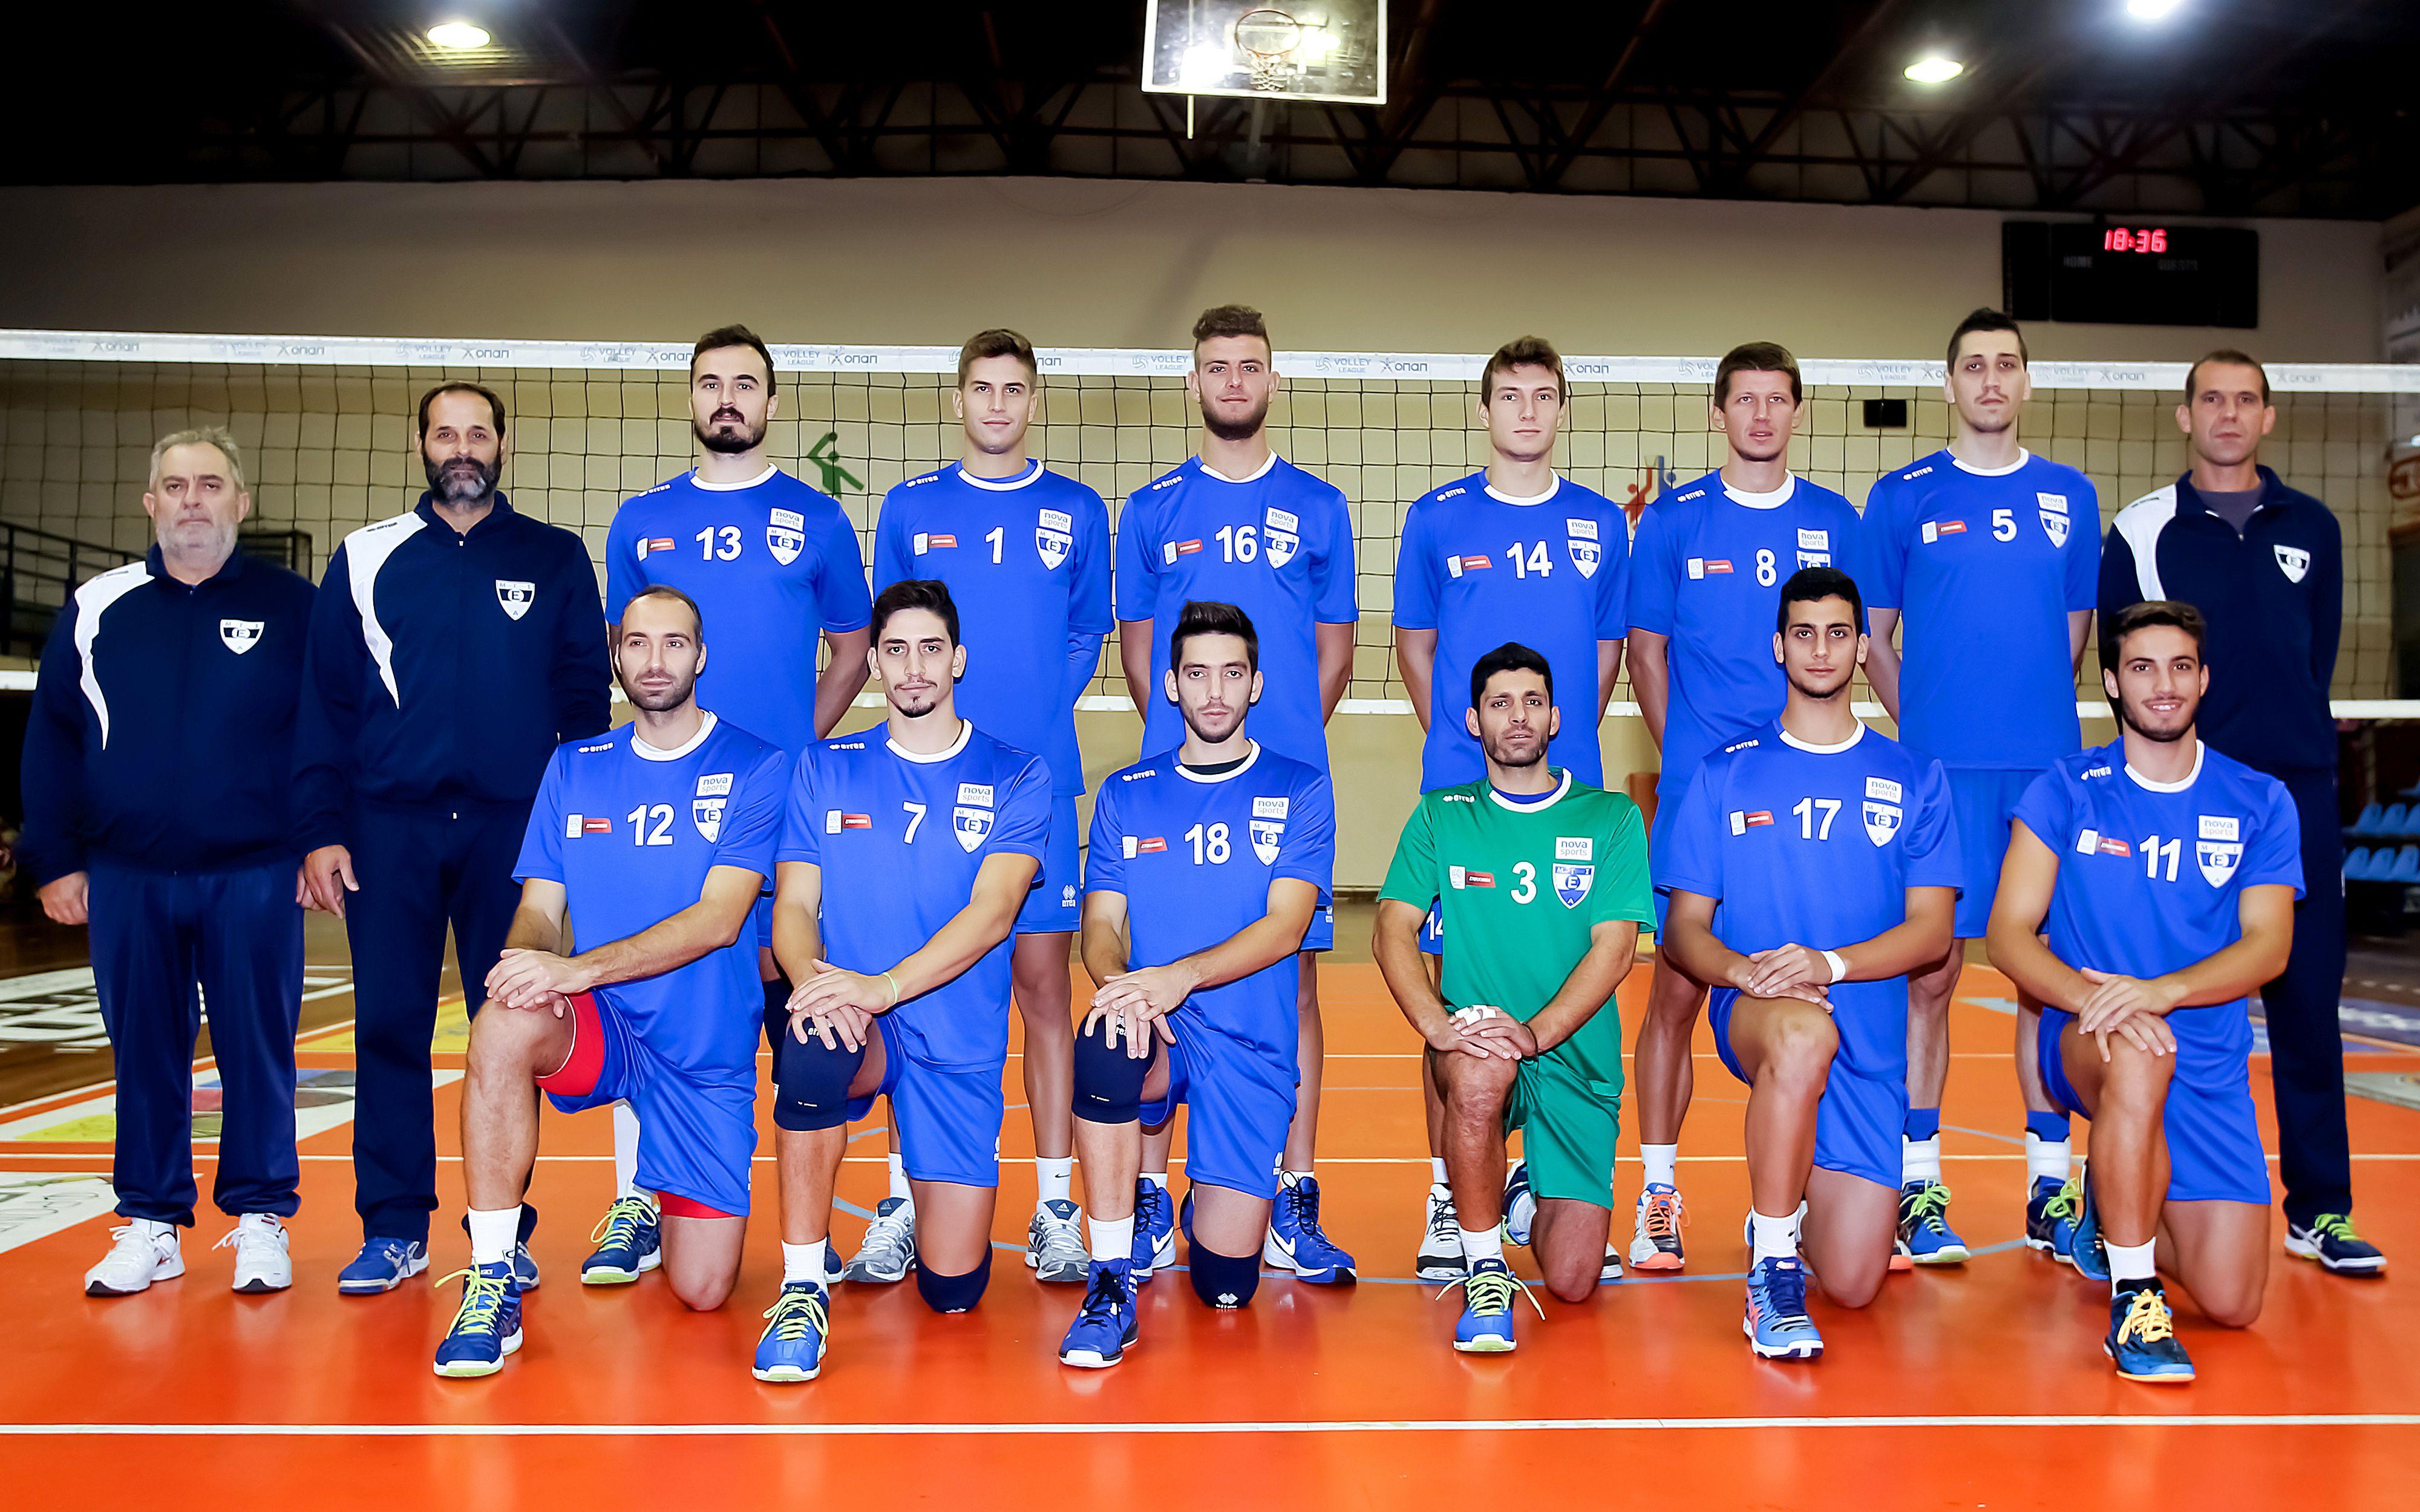 M.Γ.Σ.Εθνικός Αλεξανδρούπολης 2015-16